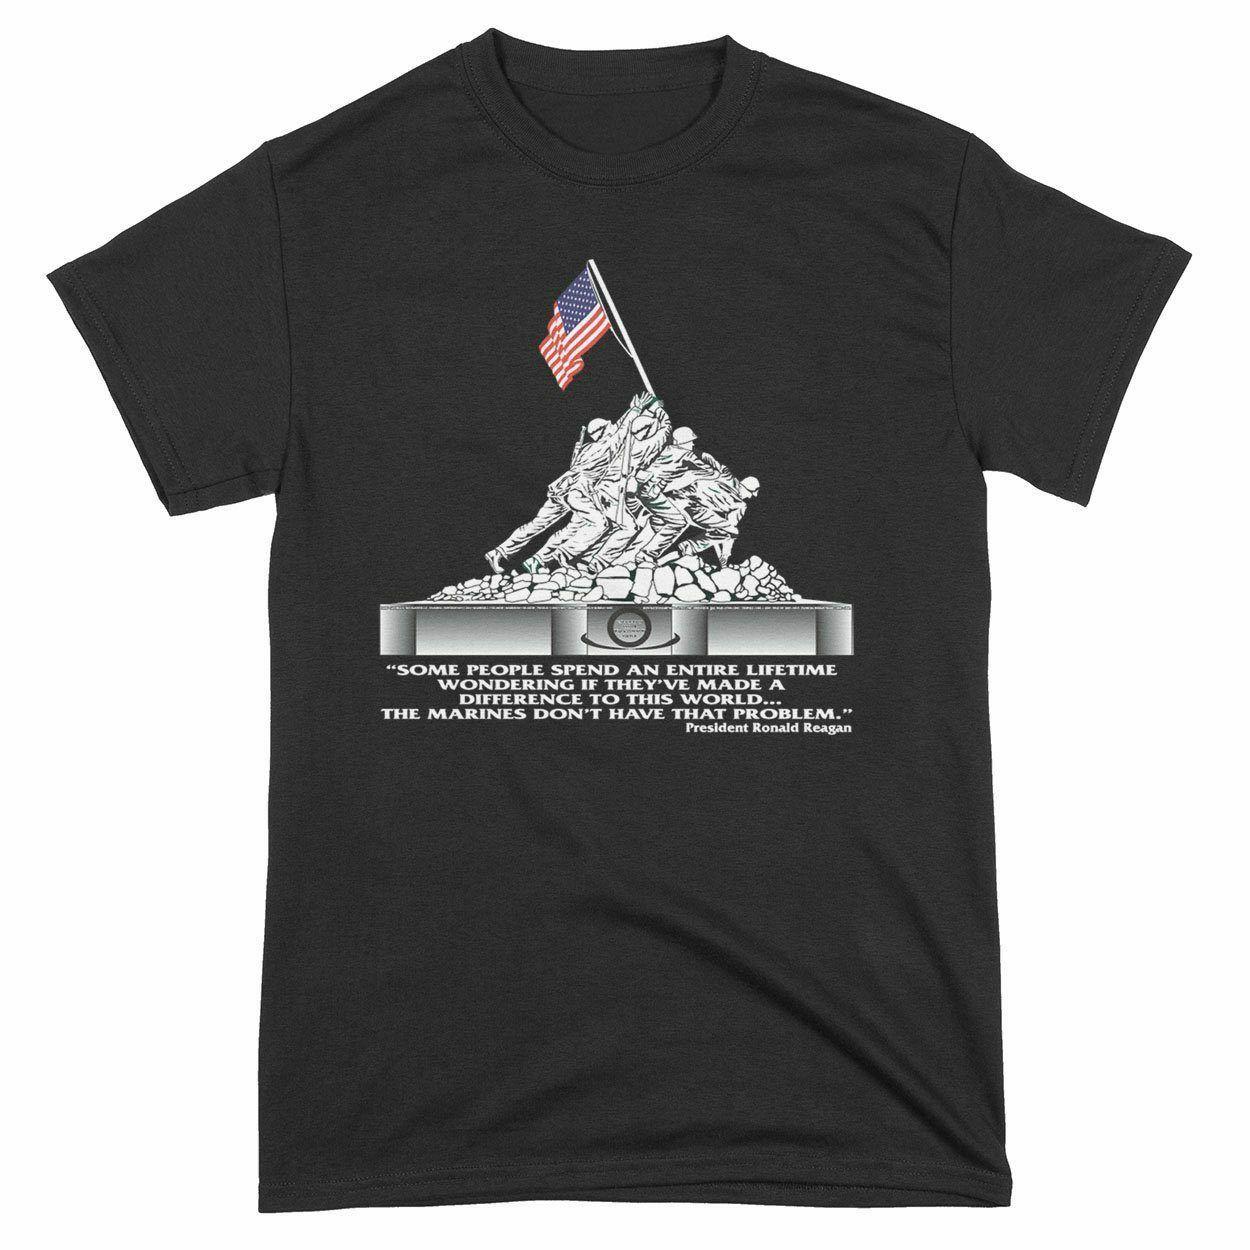 Imagen de Iwo Jima Campaign Memorial camiseta para hombre talla S-3XL